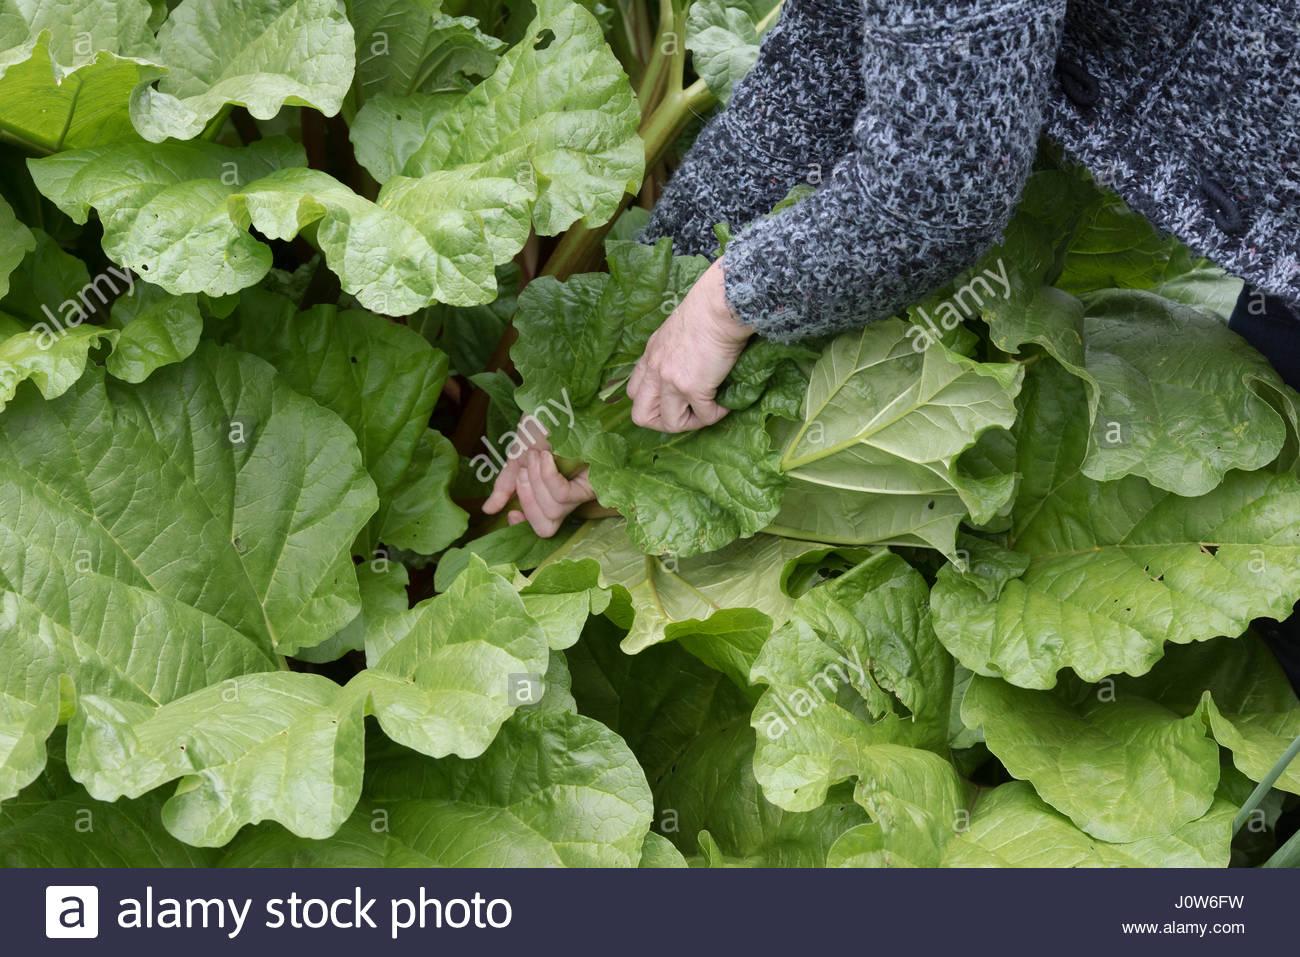 Rheum rhabarbarum. Gardener pulling up rhubarb in spring - Stock Image